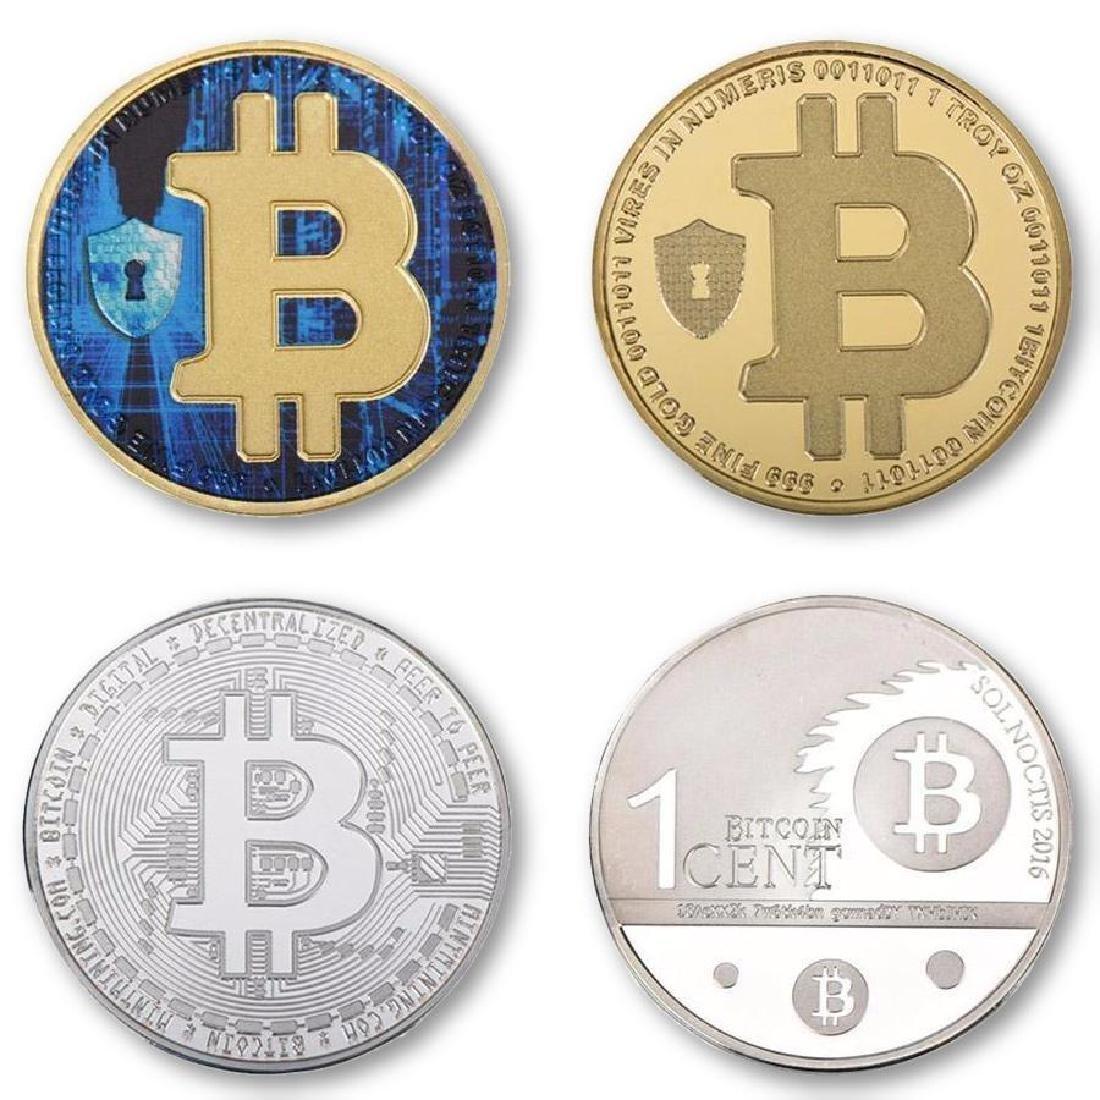 4 Bitcoin Silver and Gold Clad Collectible Coins